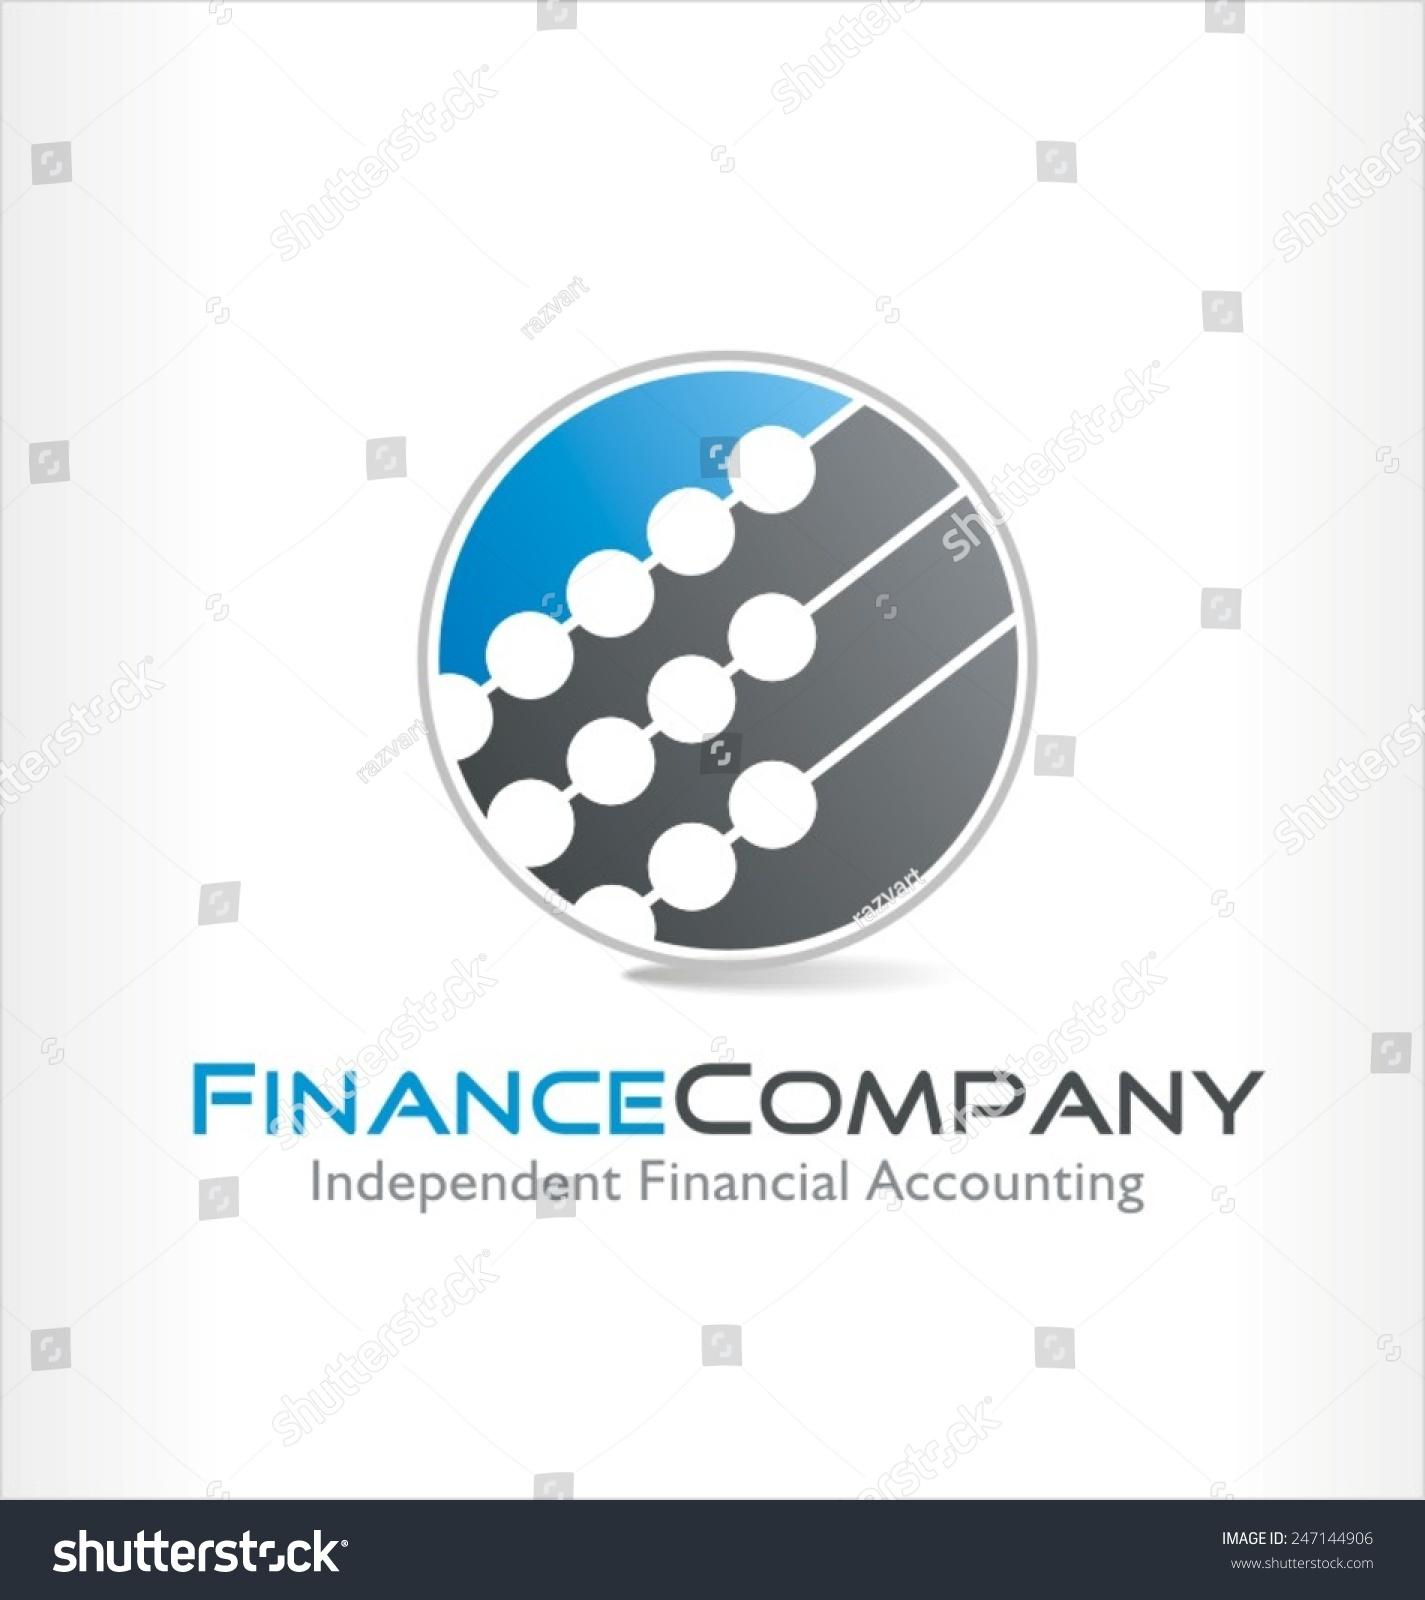 Accounting Vector Logo Symbol Stock Vector 247144906 ...